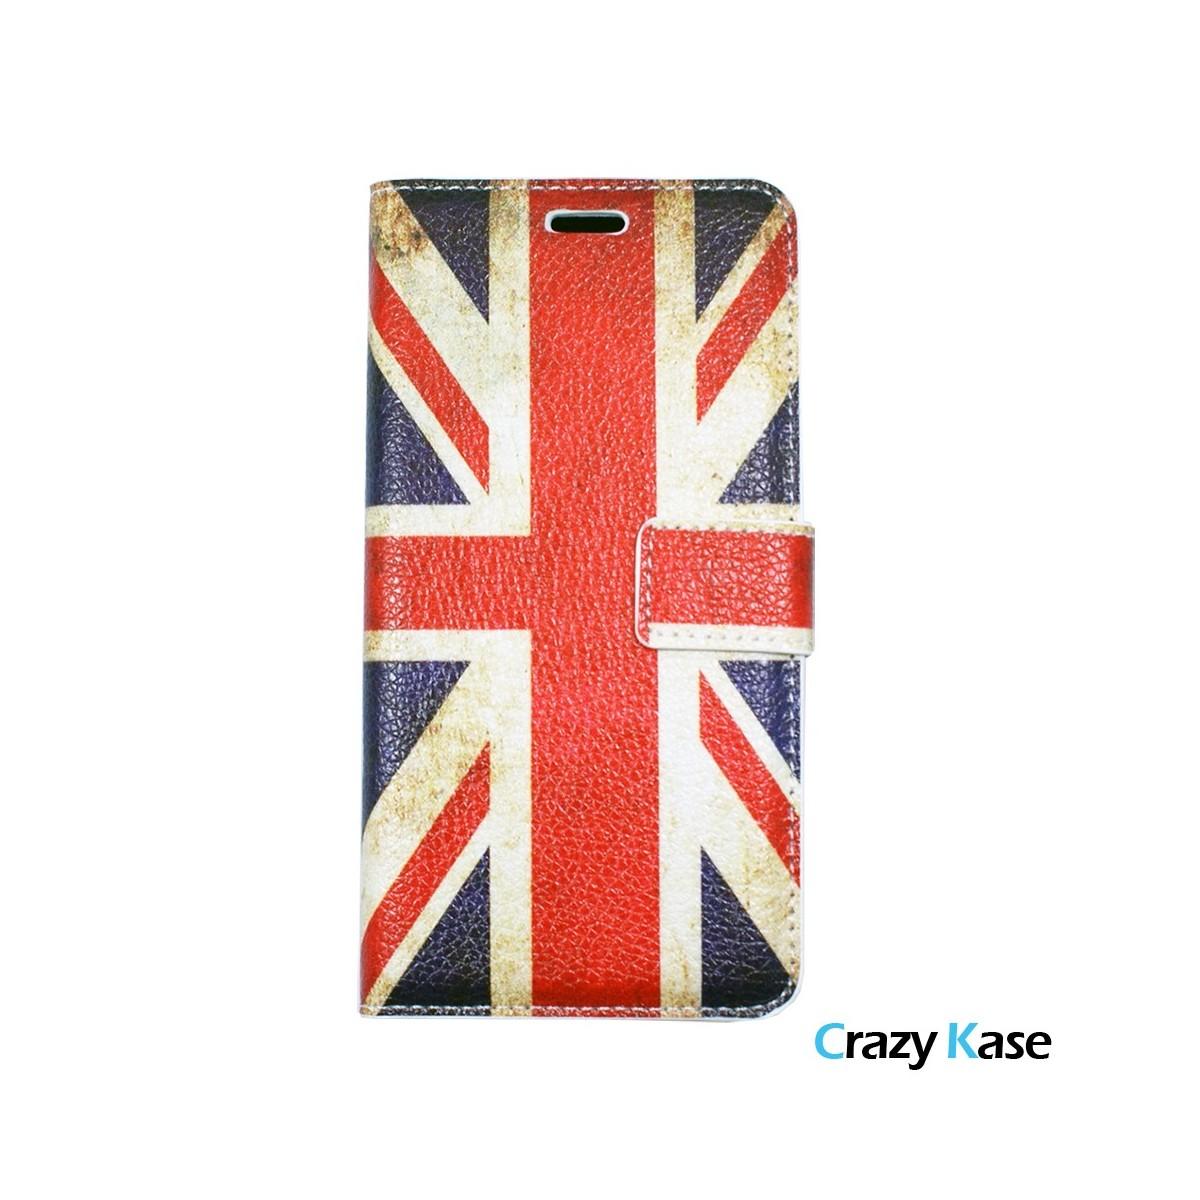 Etui Galaxy A5 (2016) motif Drapeau UK - Crazy Kase